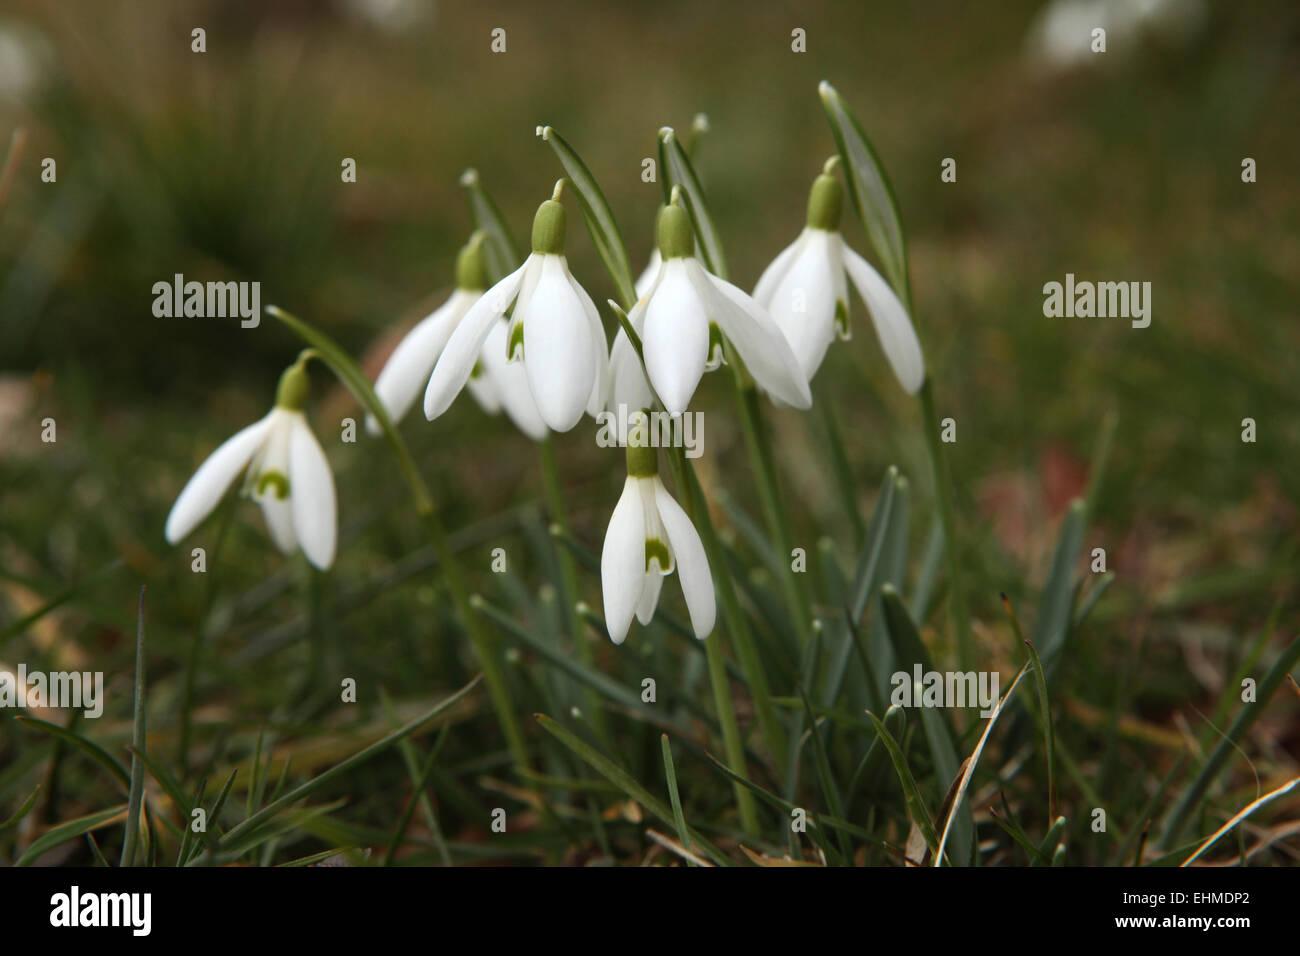 Common snowdrop (Galanthus nivalis) in Steinbach near Moritzburg, Saxony, Germany. - Stock Image